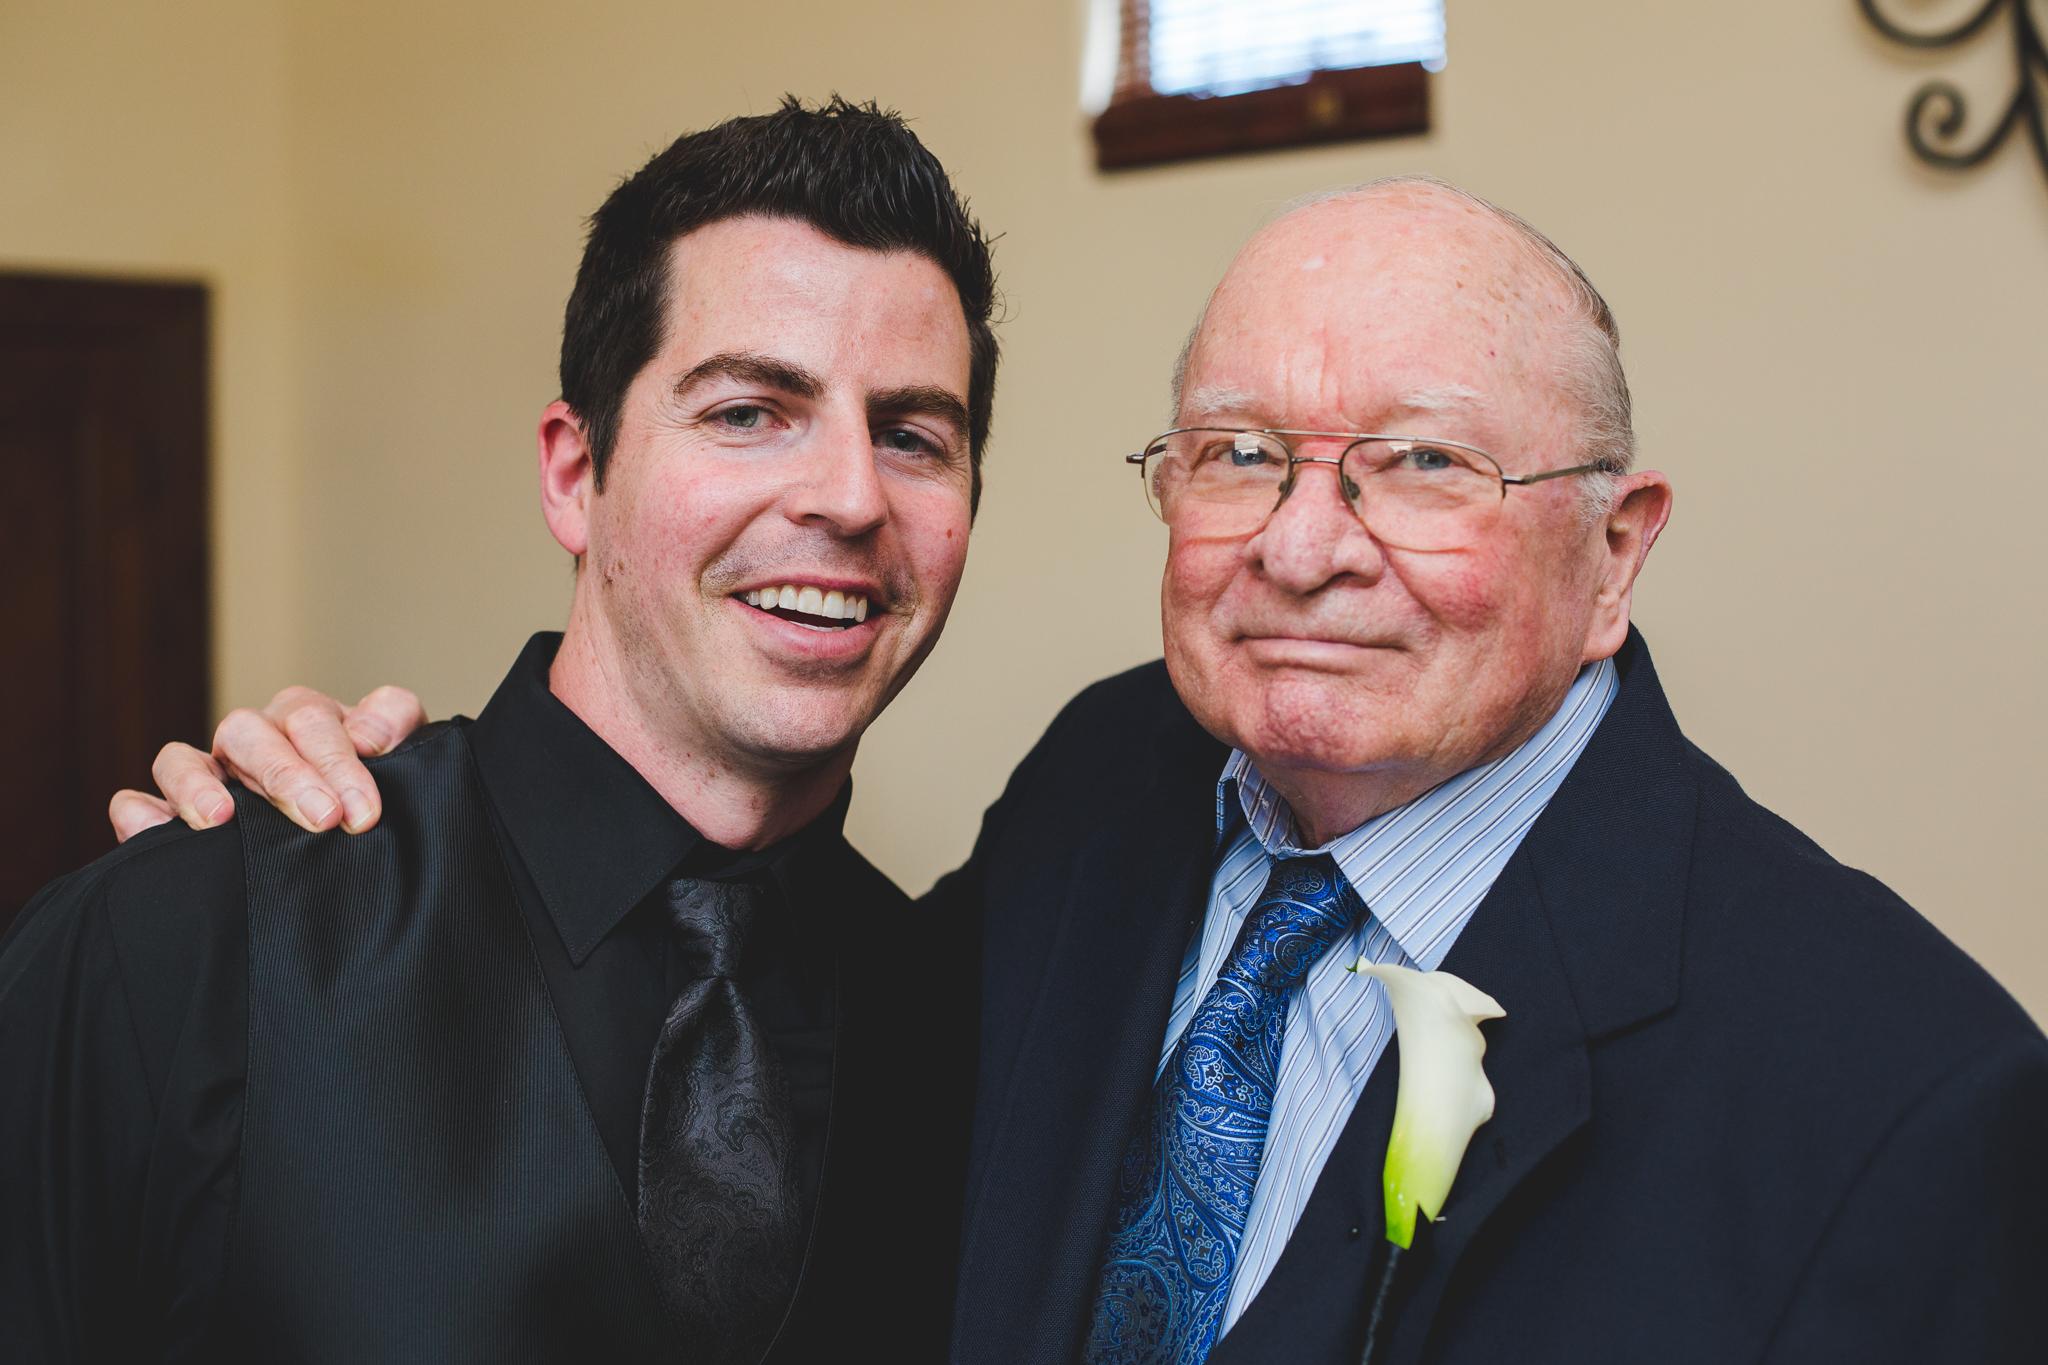 groom and grandfather mj